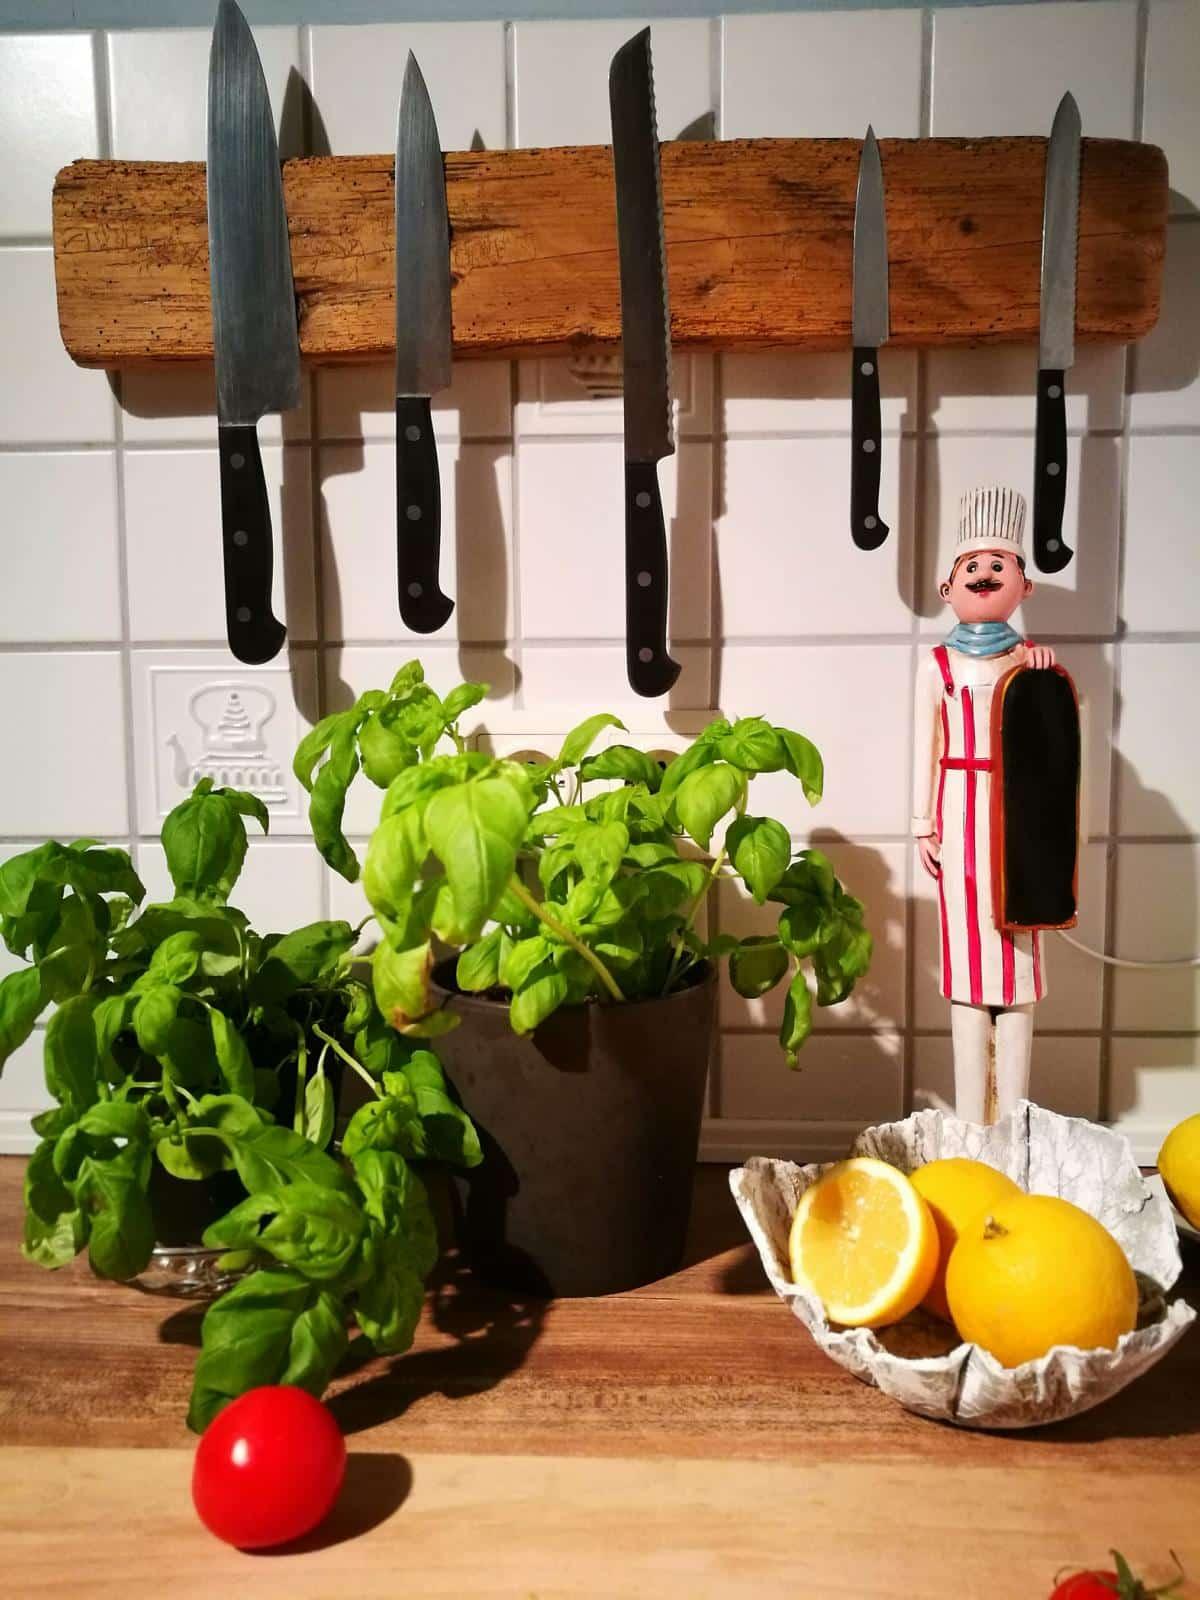 ᐅ Messerblock selber machen - DIY Ideen - 3 Hacks zum Selbermachen